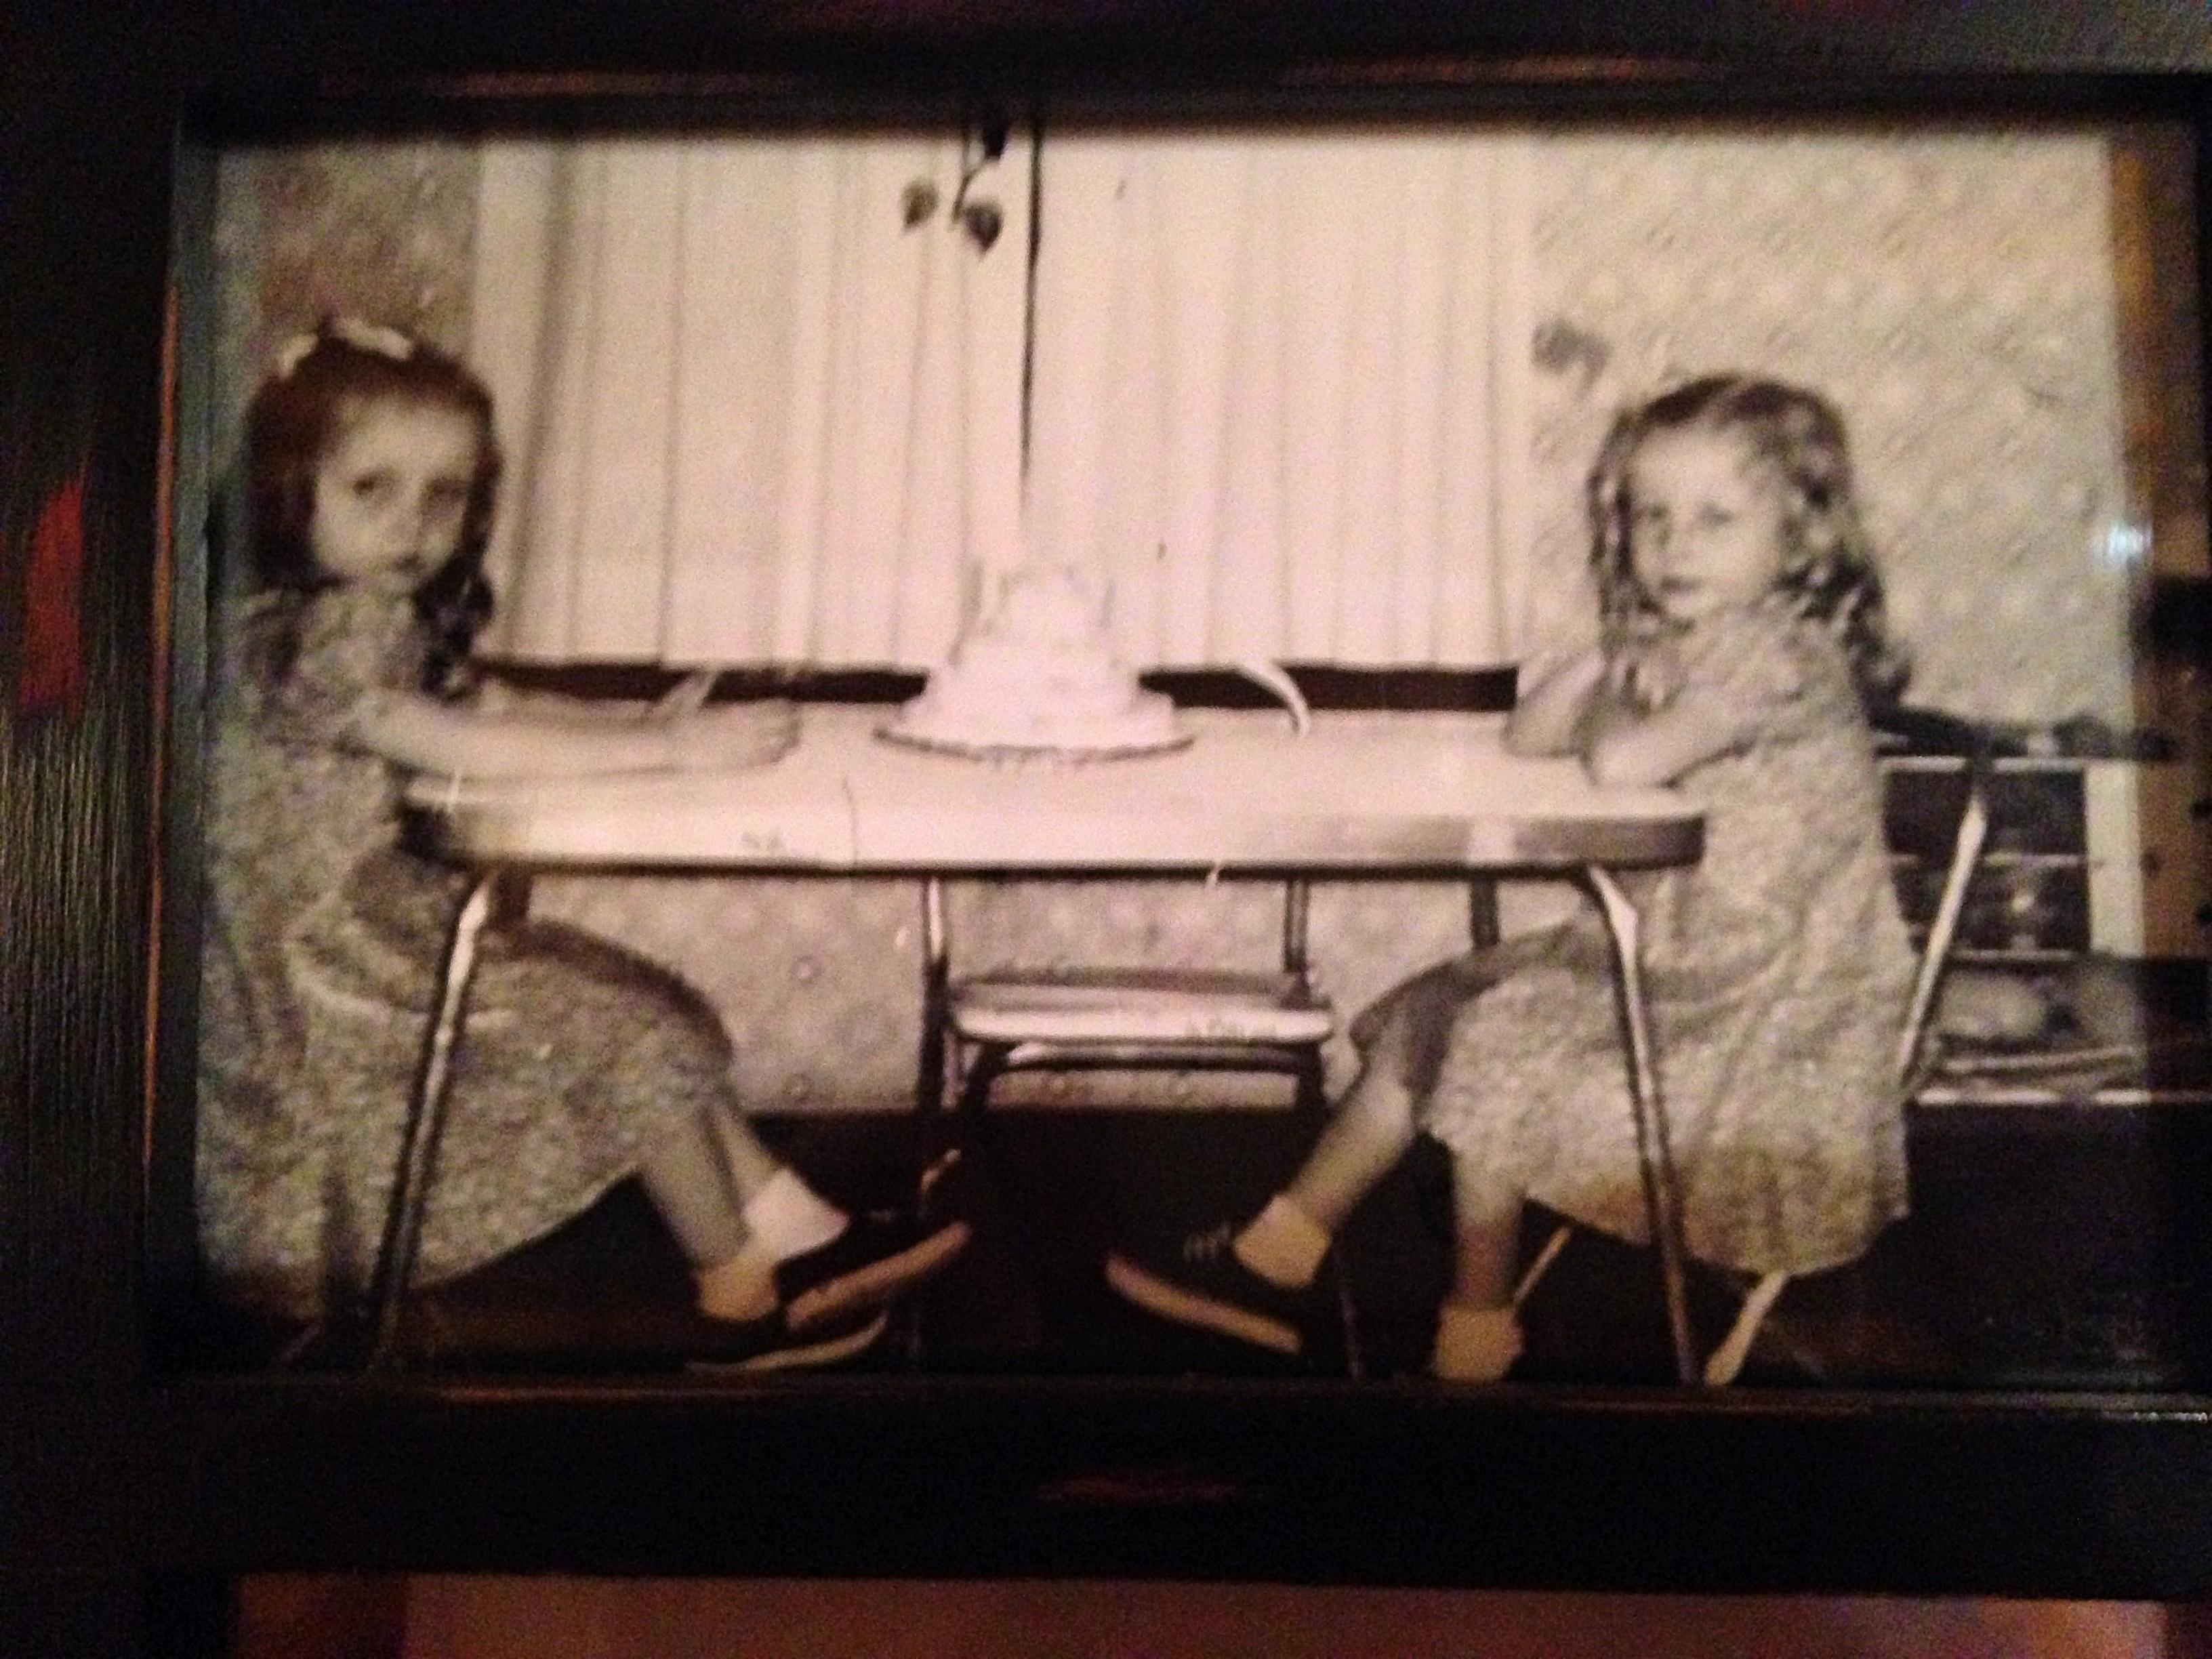 Happy Birthday to my evil twin…